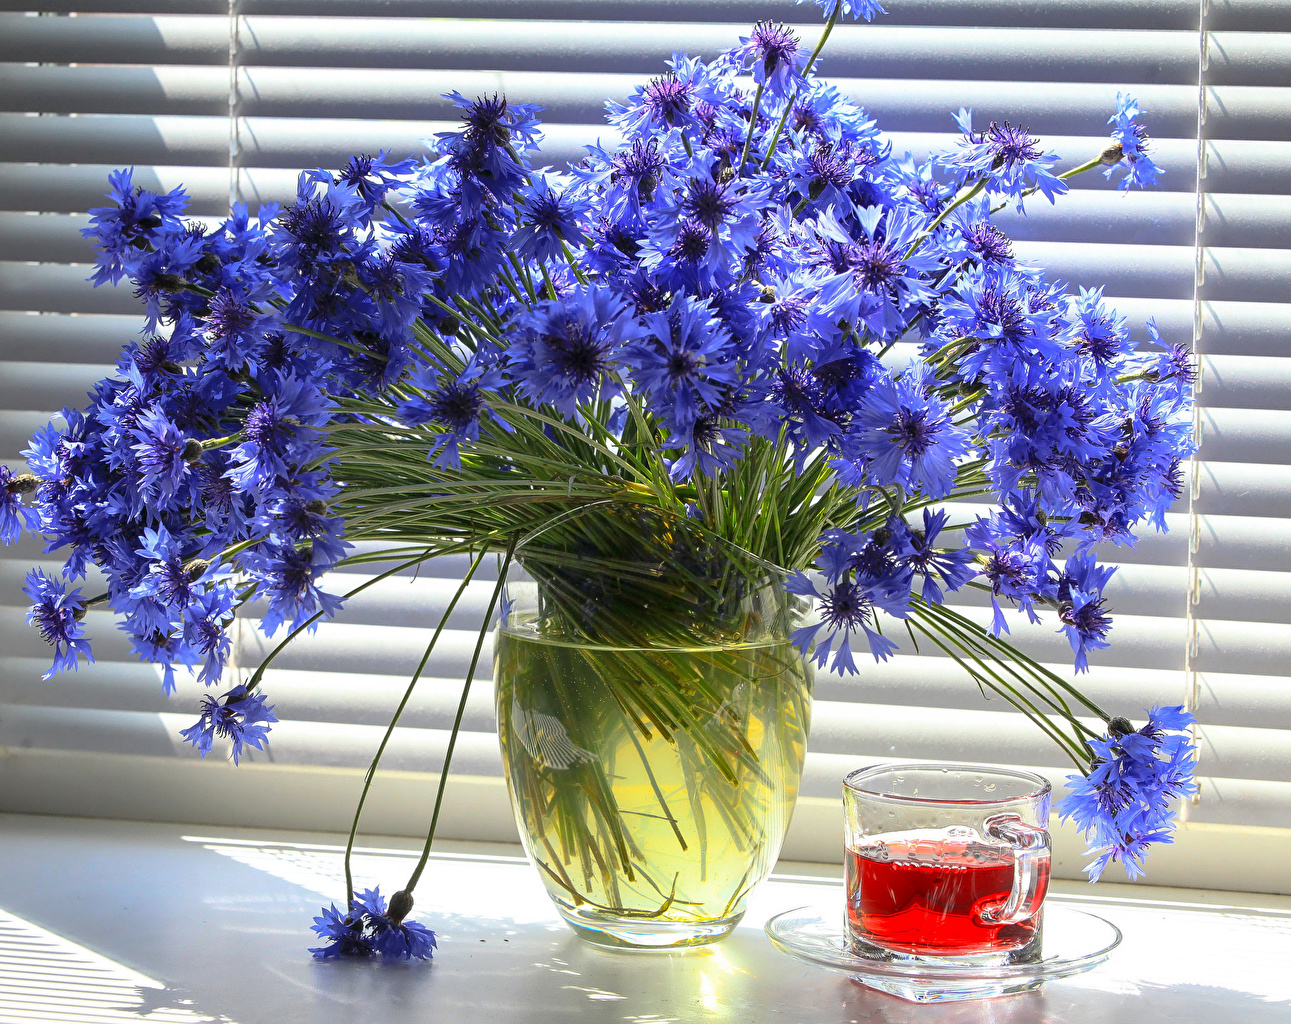 Картинки Чай Цветы Ваза Чашка Васильки Натюрморт цветок вазе вазы чашке